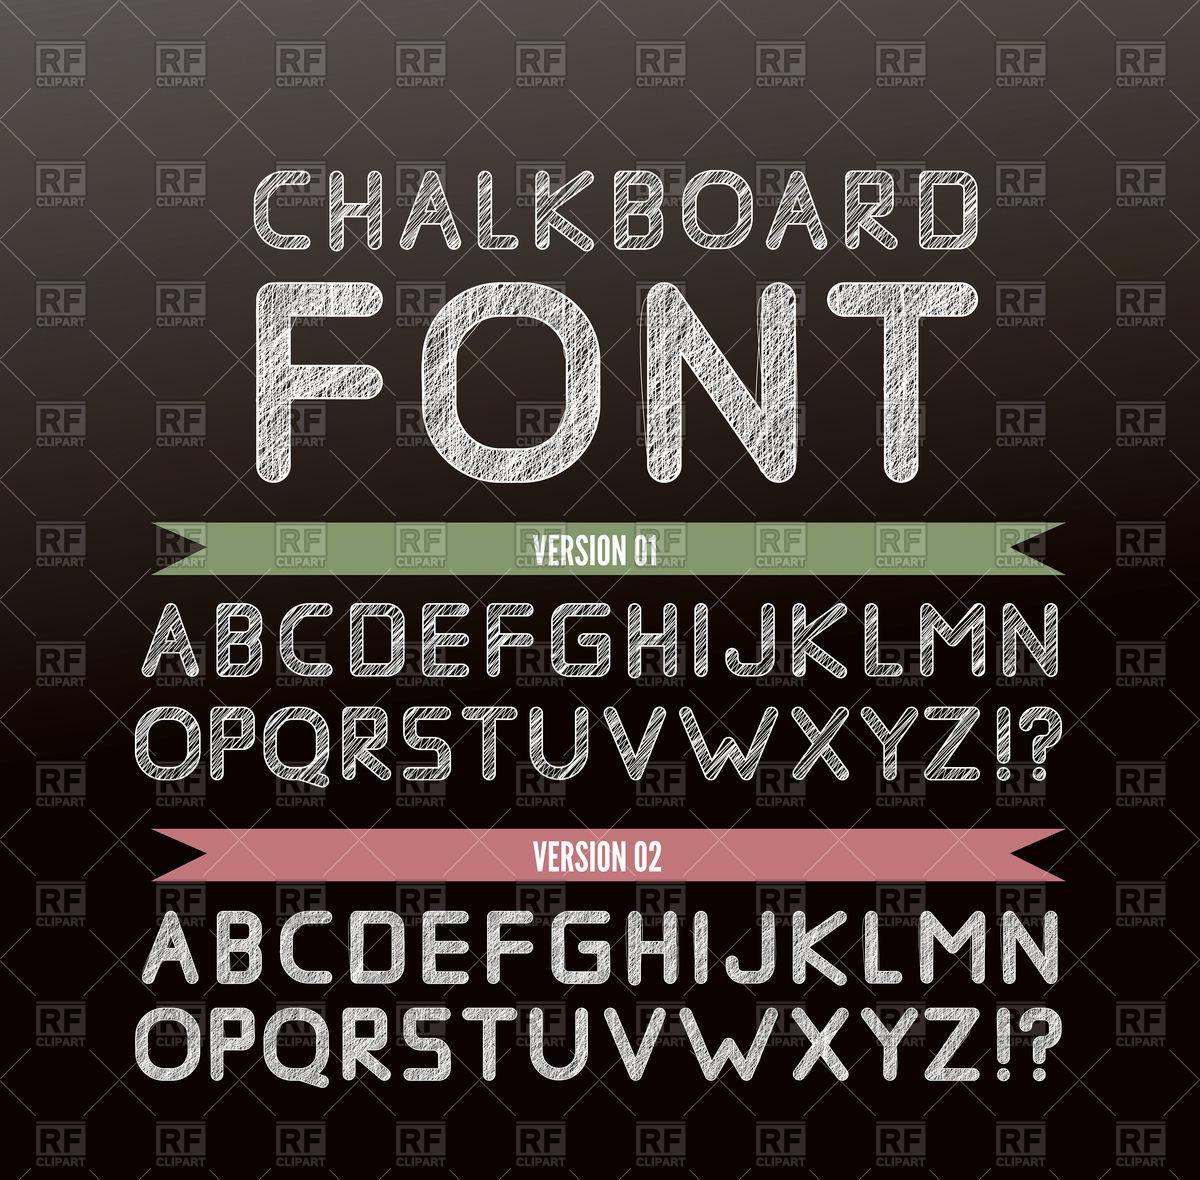 Chalkboard clip art download freeuse stock Chalk clip art free download - ClipartFest freeuse stock